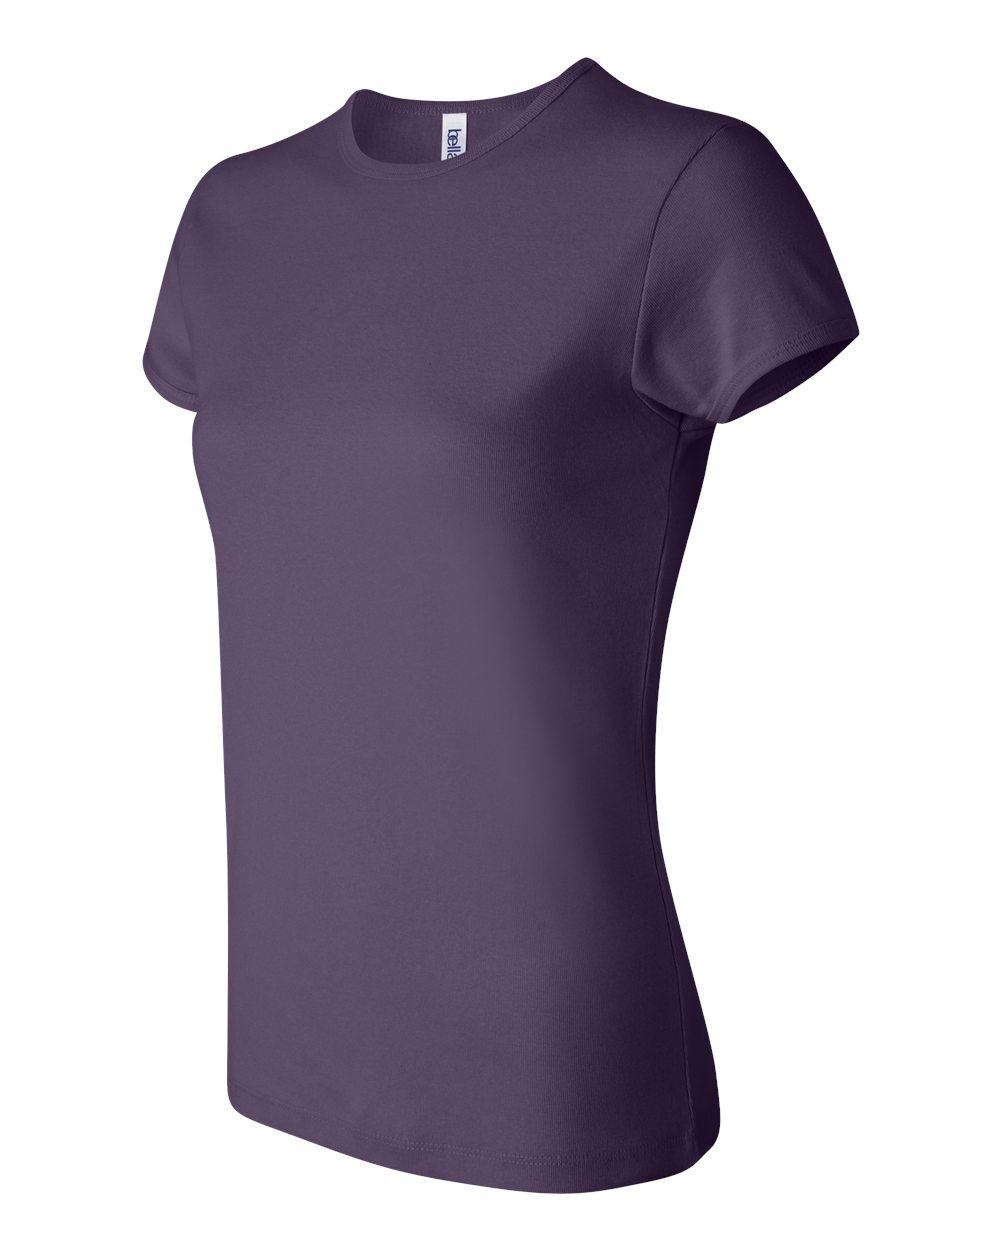 Bella 1001 Purple